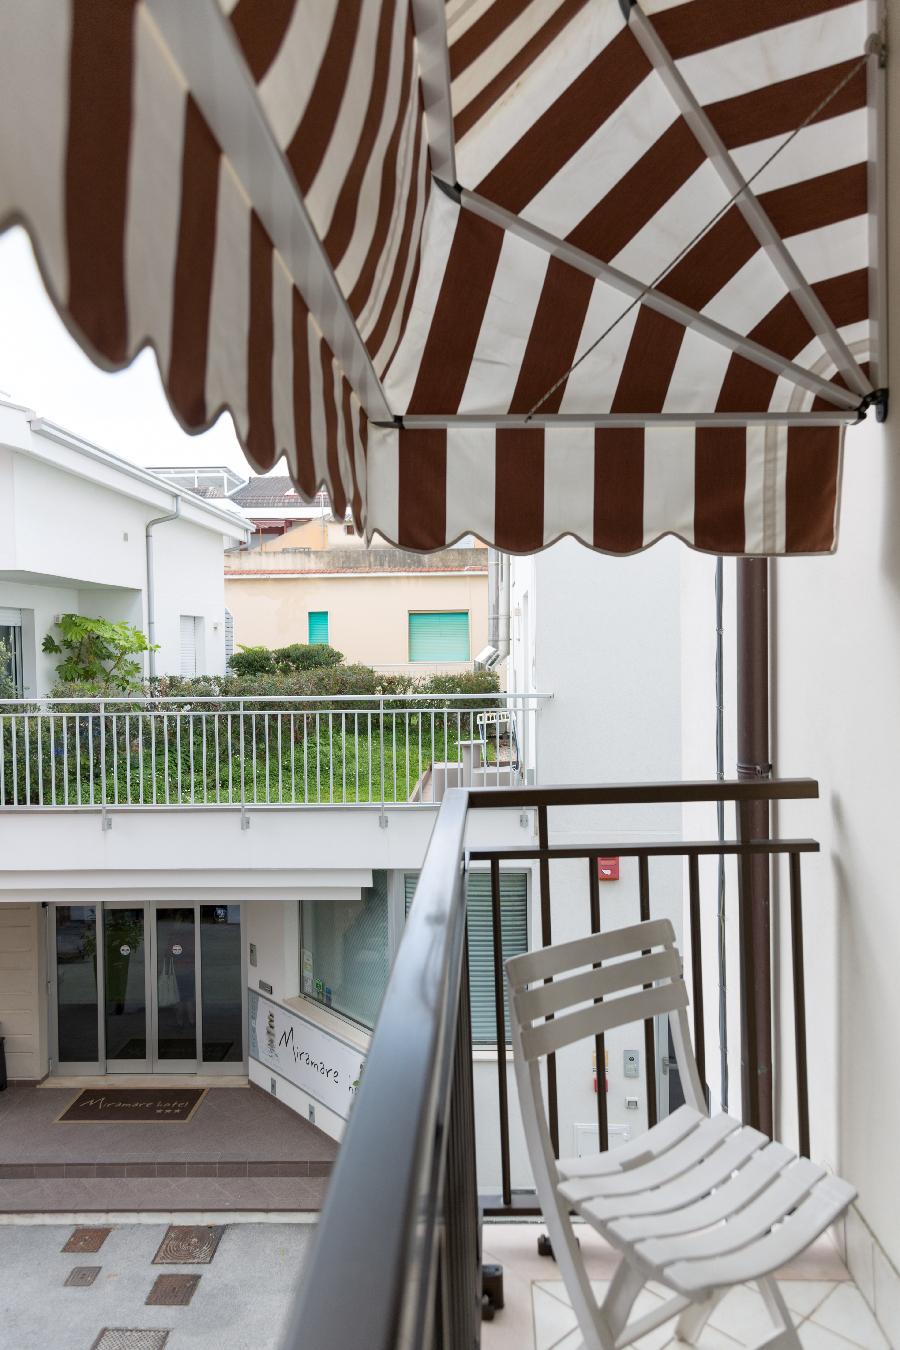 Miramare Hotel Dipendenza Tripla Superior 25